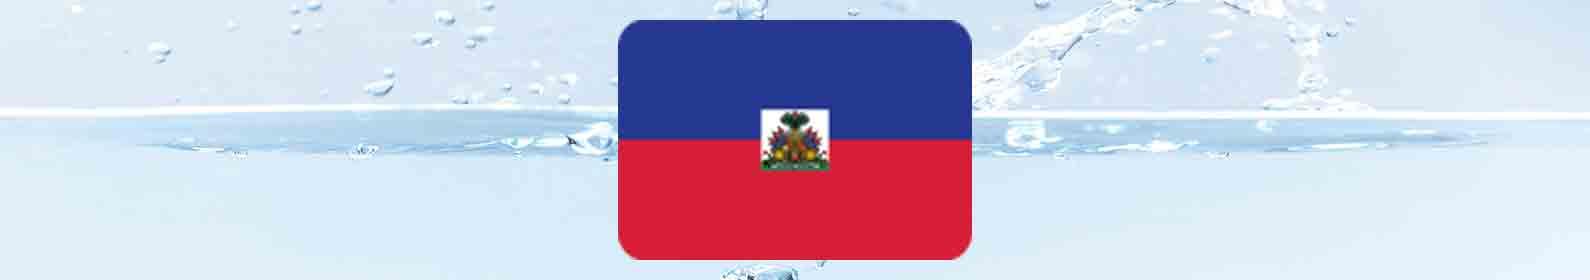 tratamento-de-agua-haiti.jpg